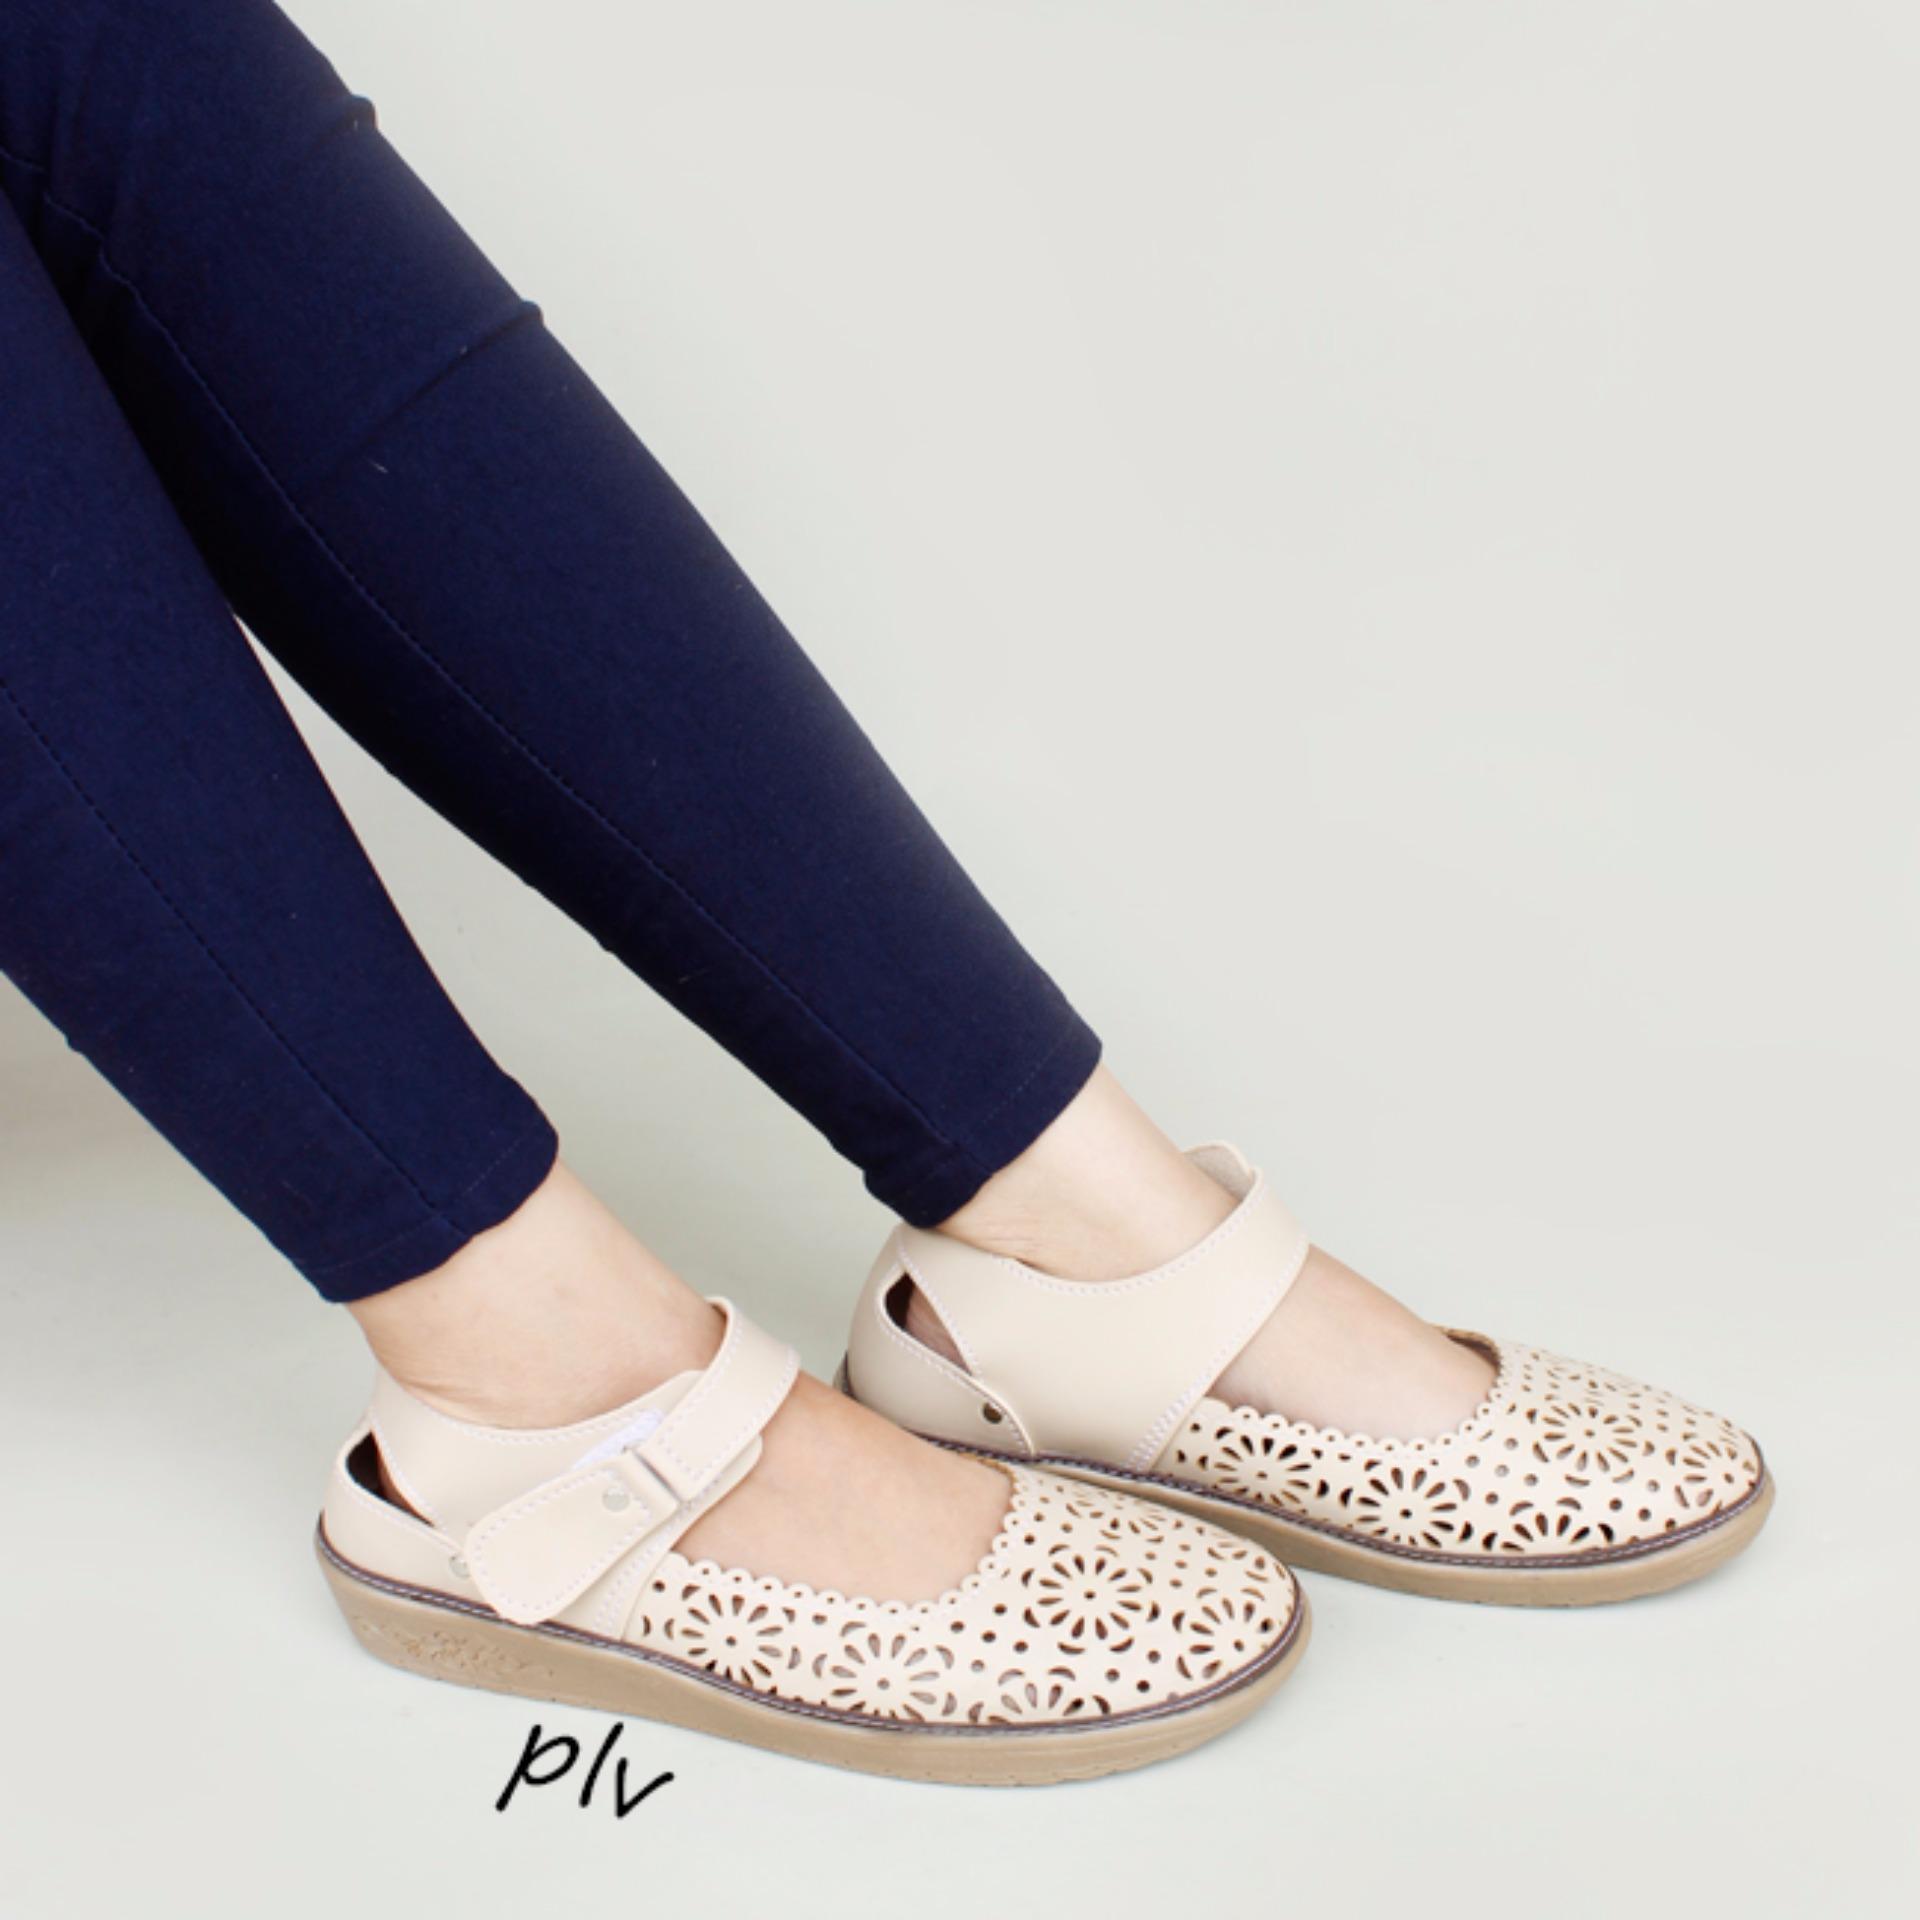 Grivera Sepatu Wanita Flat Shoes Laser B20 Tan Daftar Update Harga Belakang Cream My81